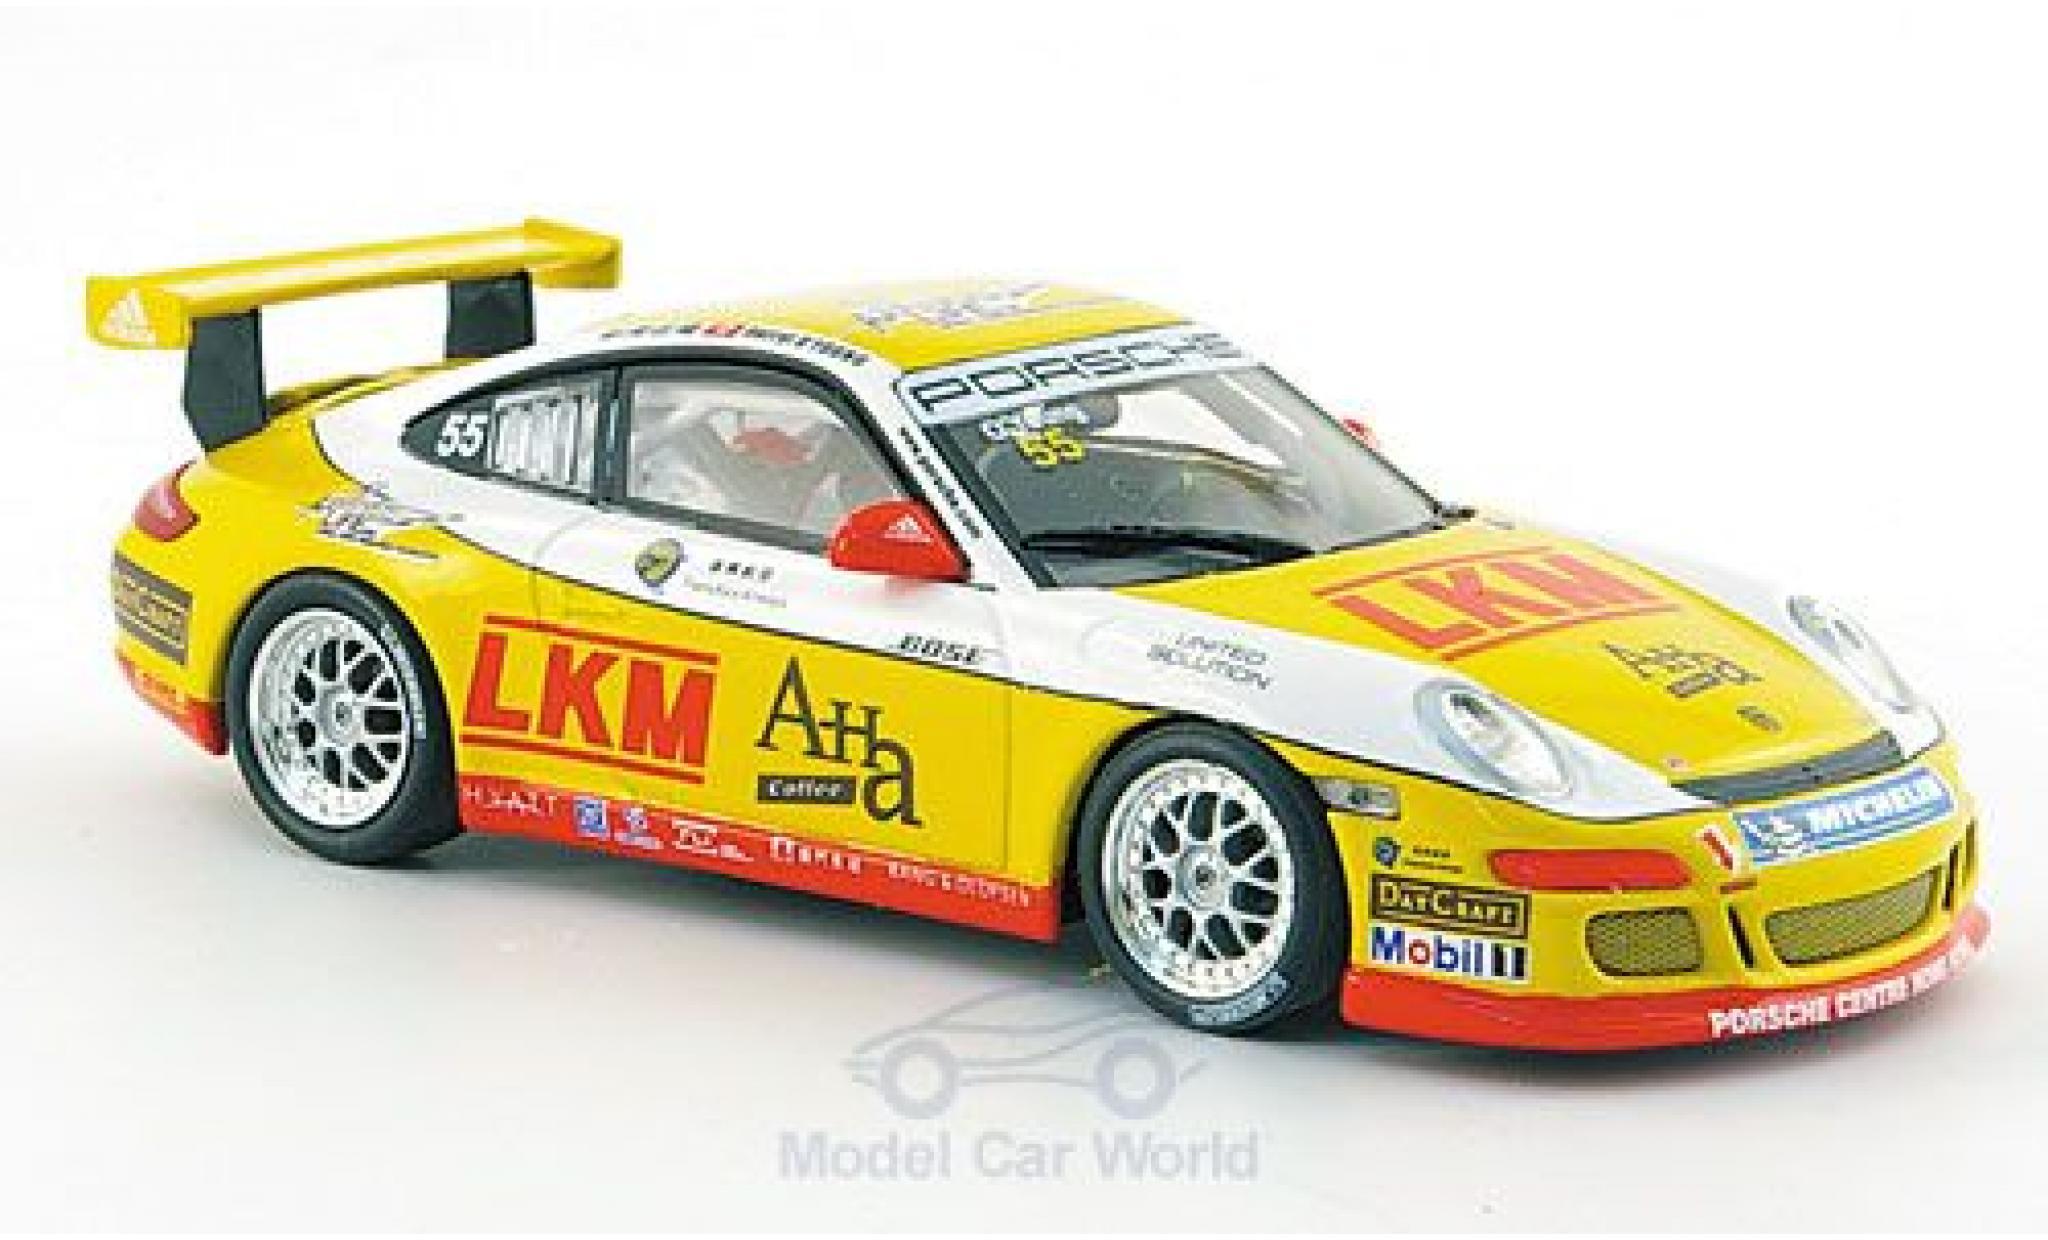 Porsche 997 SC 1/43 Minichamps GT3 Cup No.55 Asian Carrera Cup Macau 2007 O Young